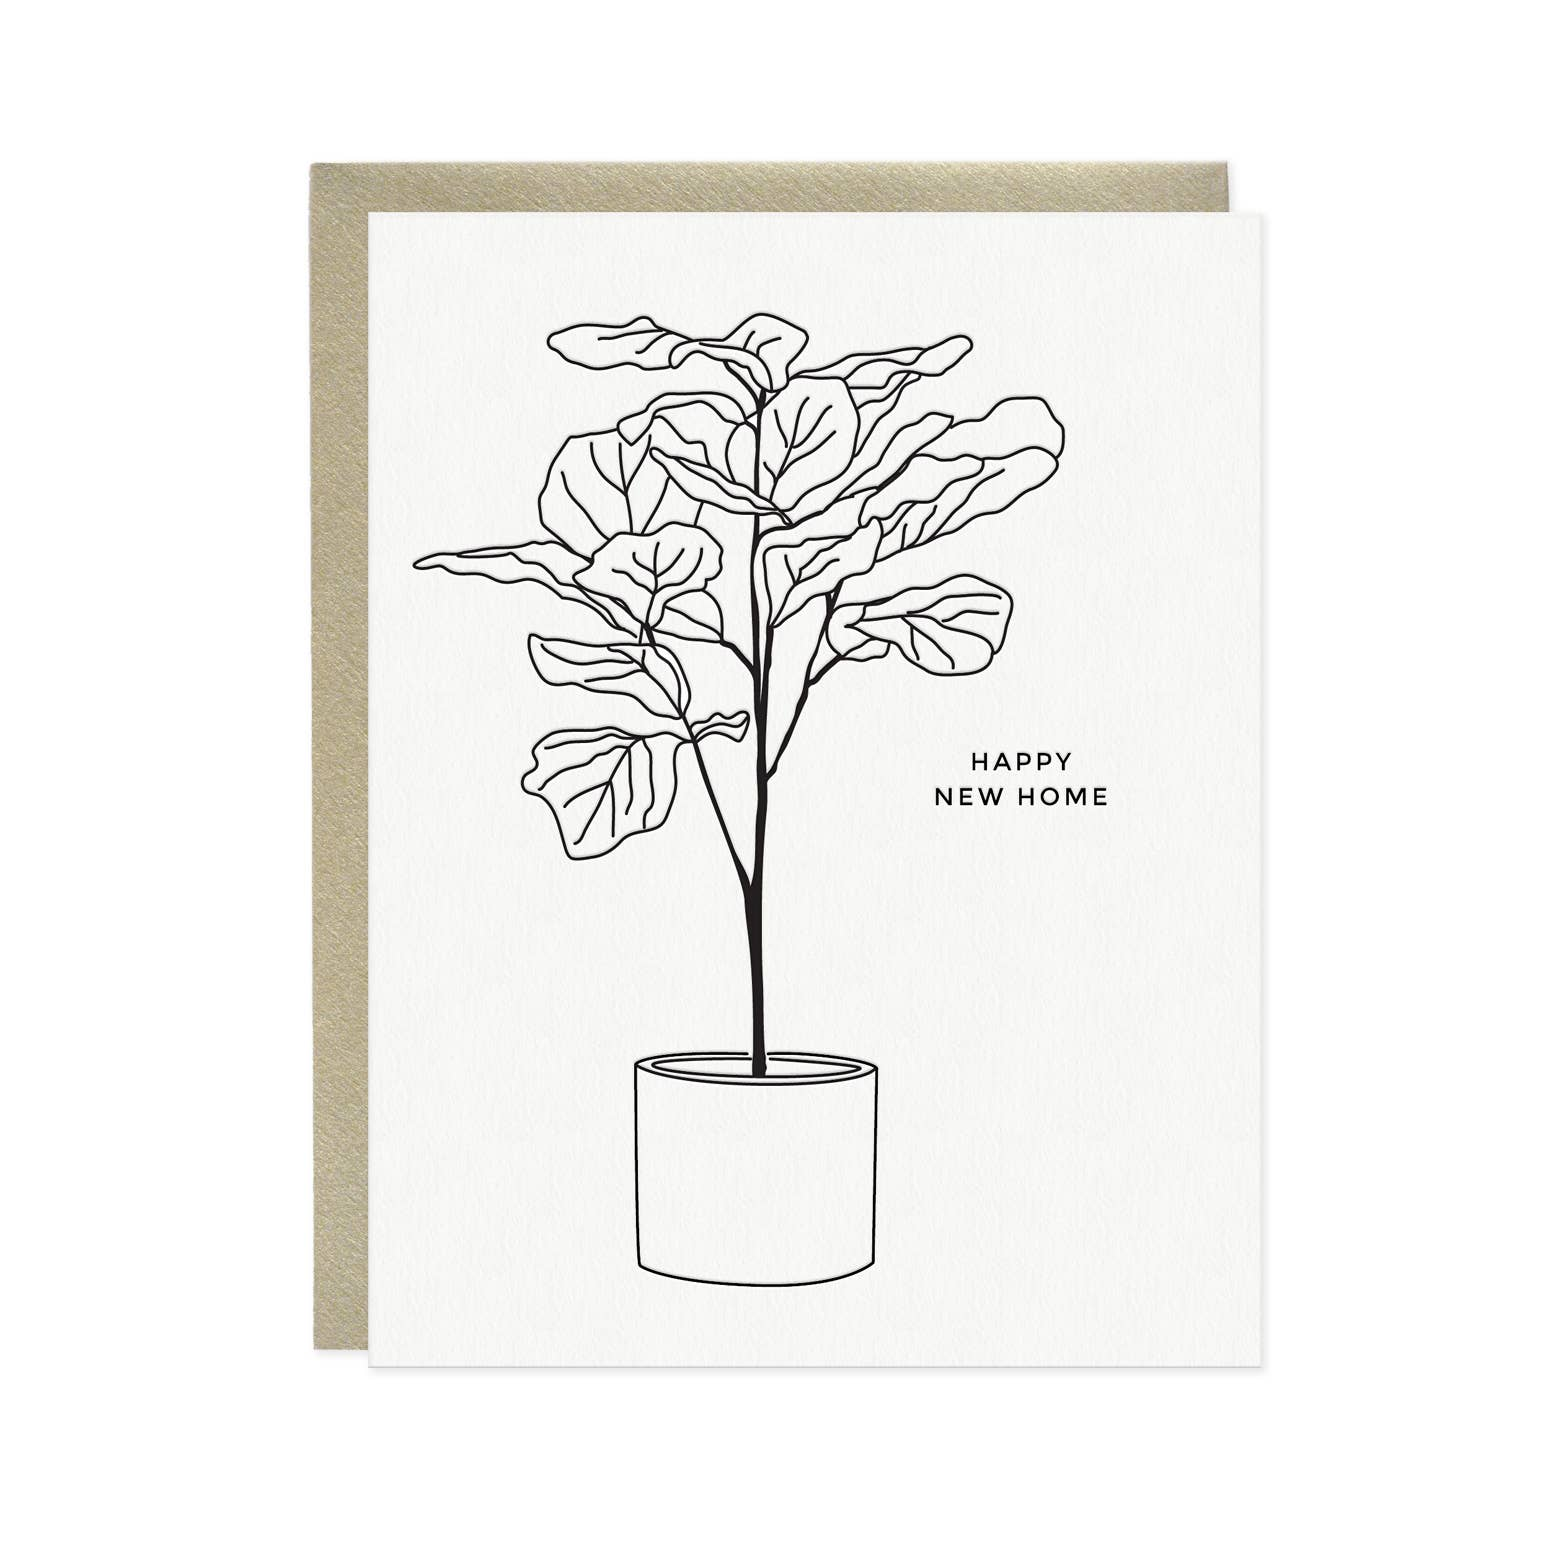 Linework Fiddle Leaf Fig Tree New Home Card | Trada Marketplace